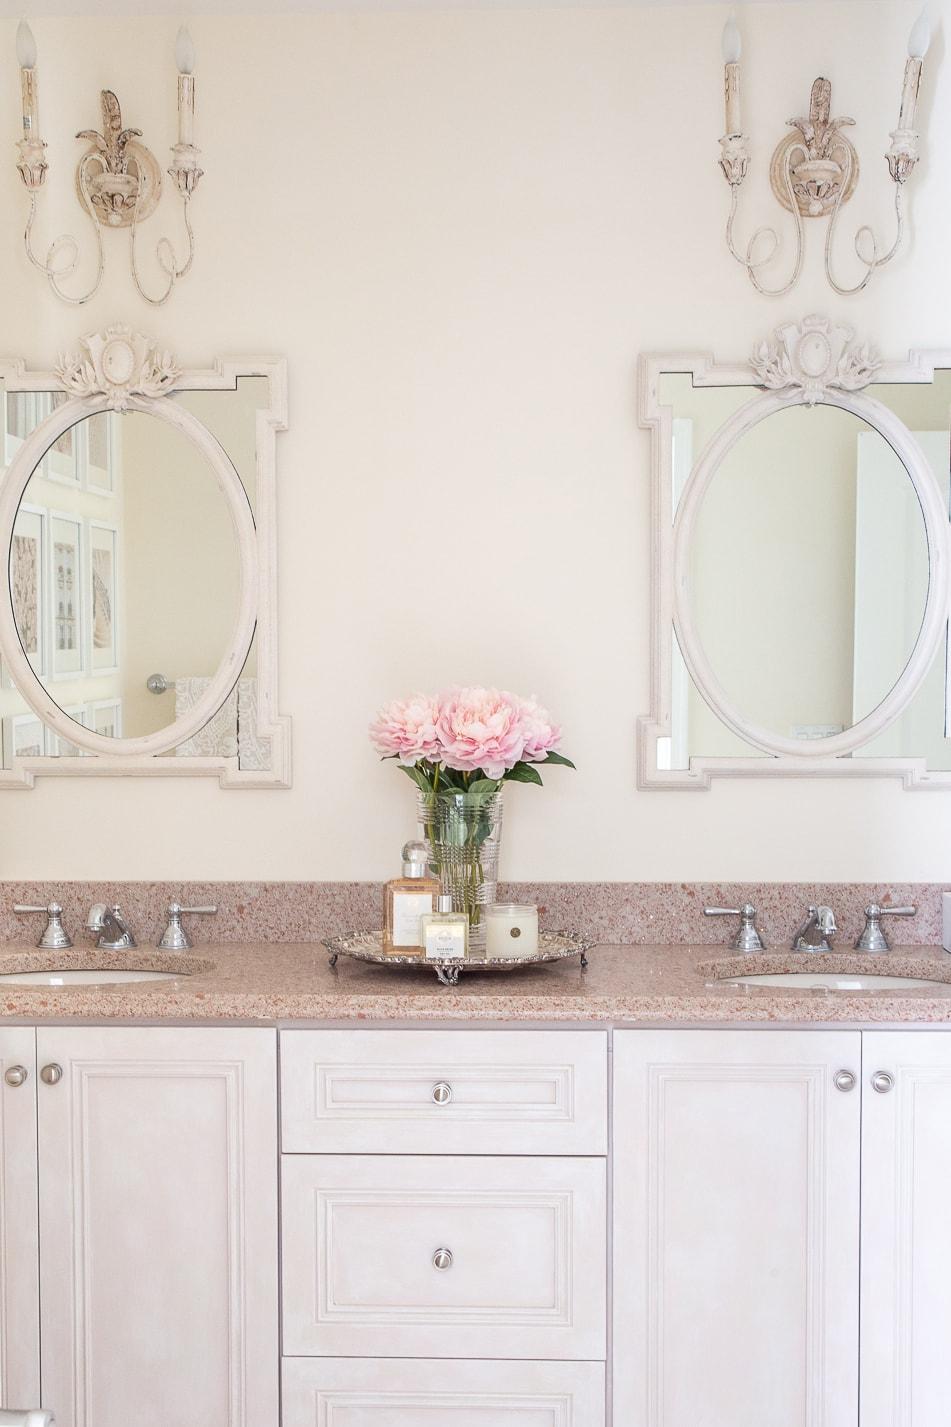 organized bathroom vanity drawers